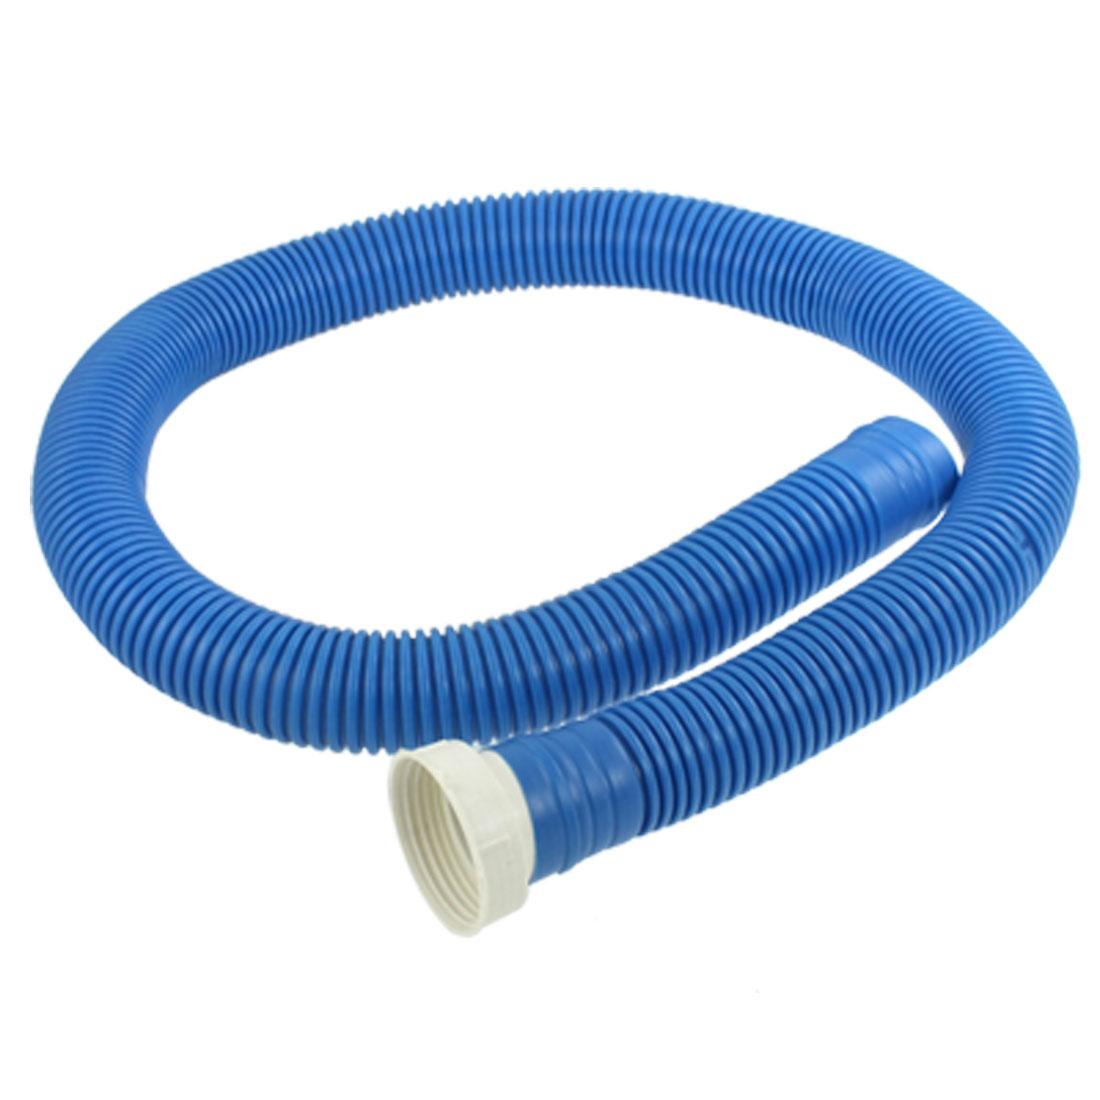 "Blue Plastic 1 3/5"" Diameter Threaded Extensible Flexible Water Drain Hose"